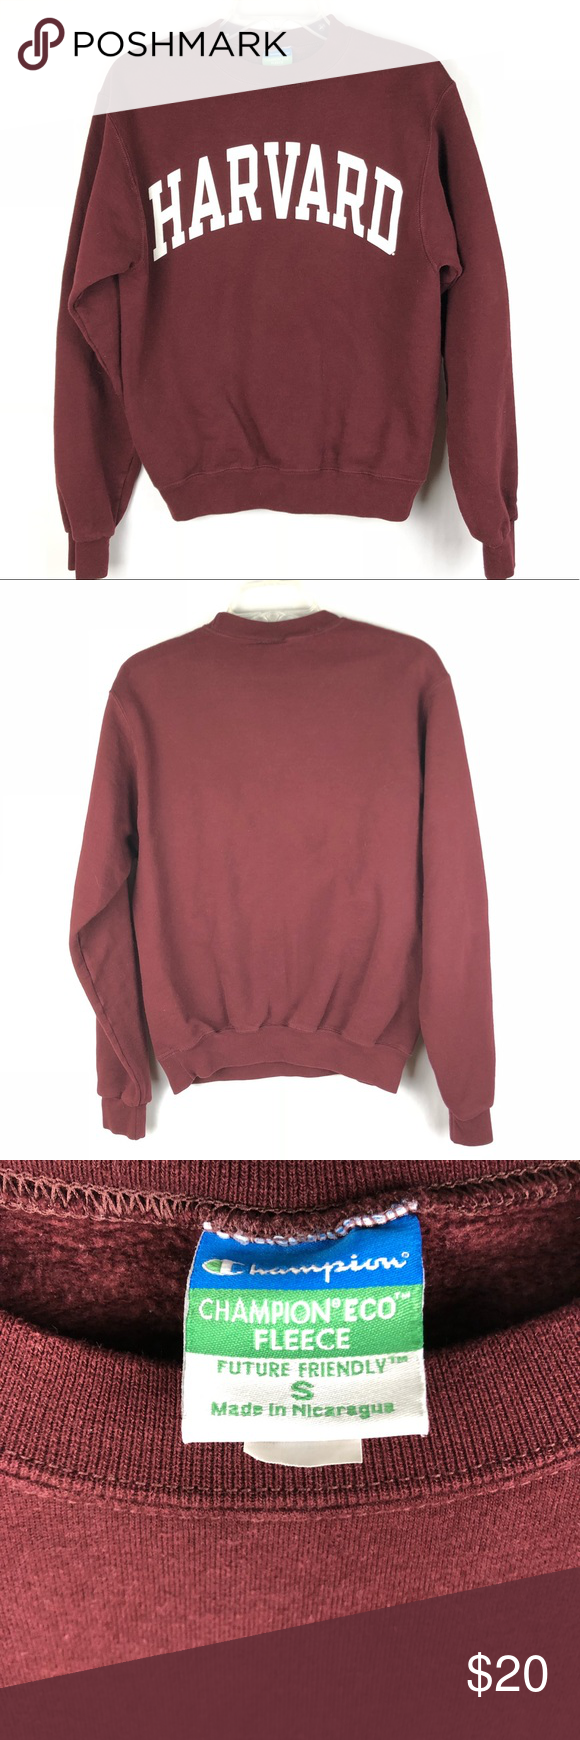 Champion Eco Fleece Harvard Sweatshirt Size Small Sweatshirts Sweatshirt Fleece Harvard Sweatshirt [ 1740 x 580 Pixel ]